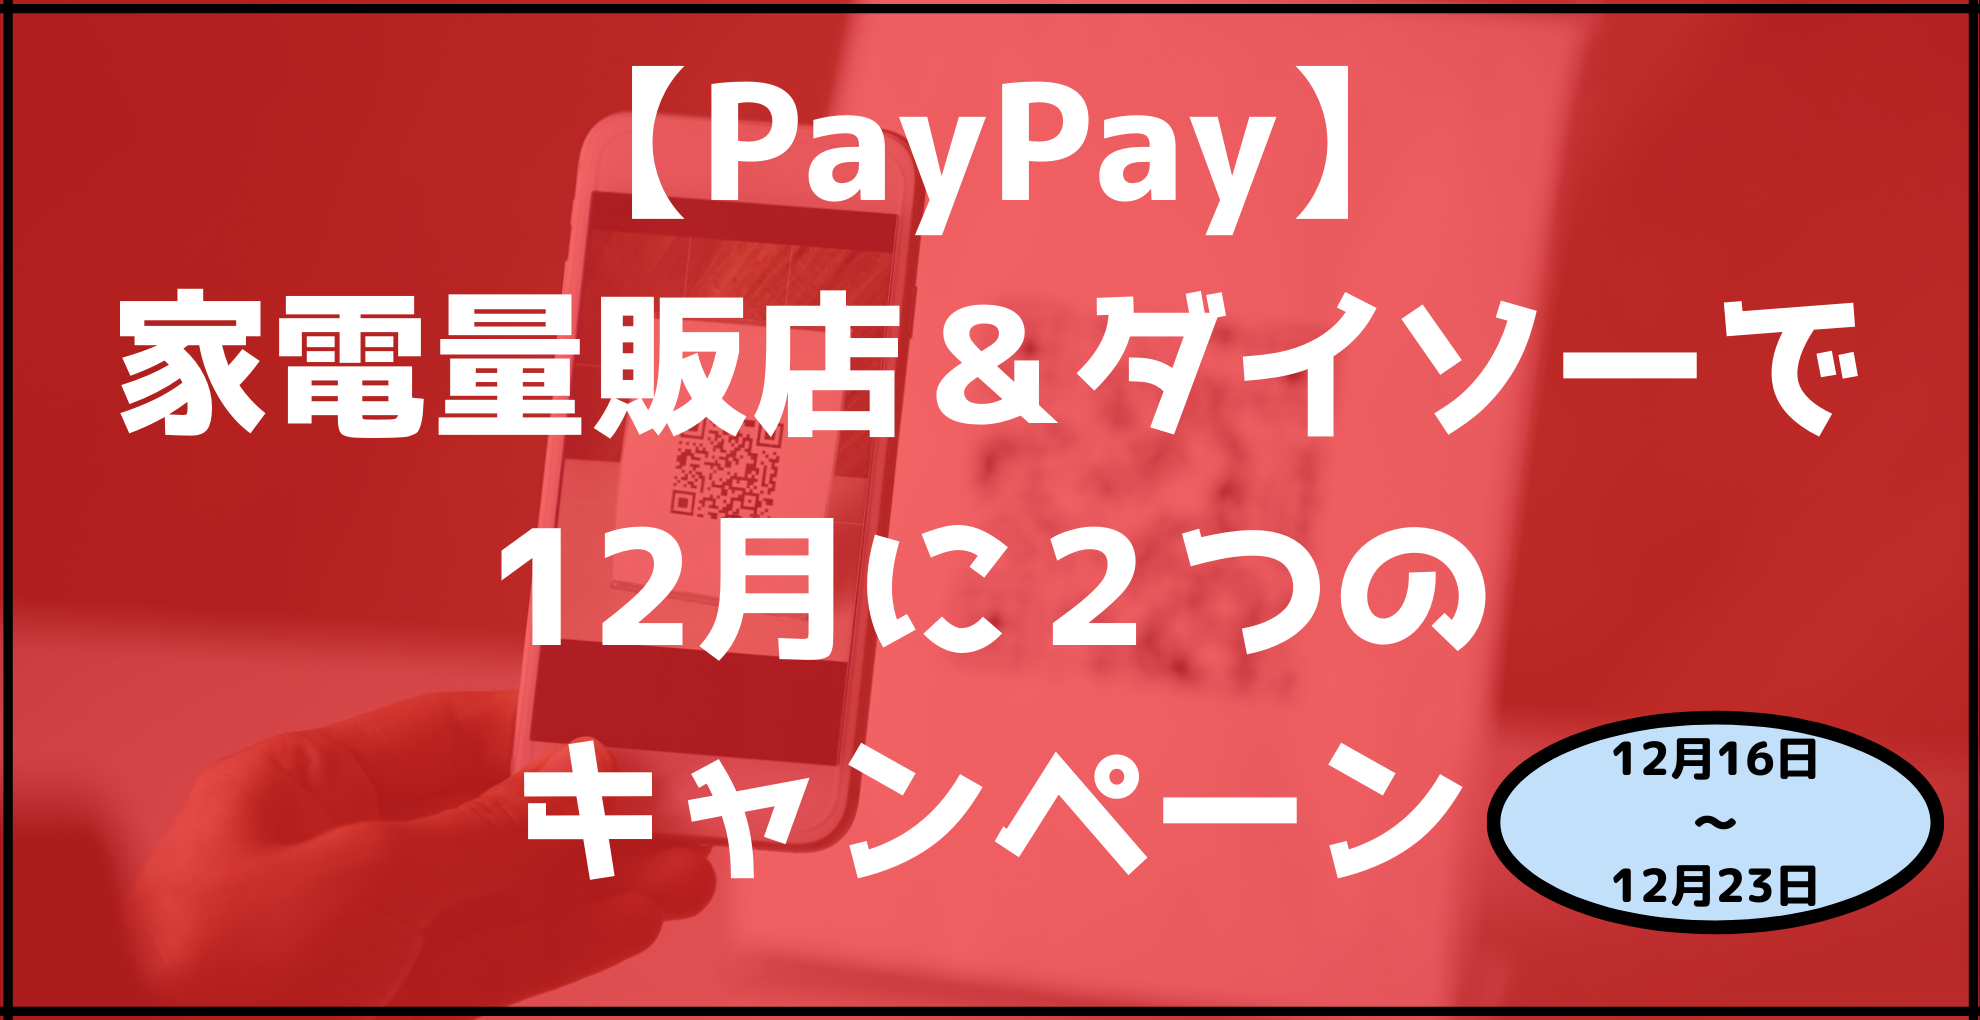 【PayPay】 「家電量販店」と「ダイソー」で12月に2つのキャンペーンを実施